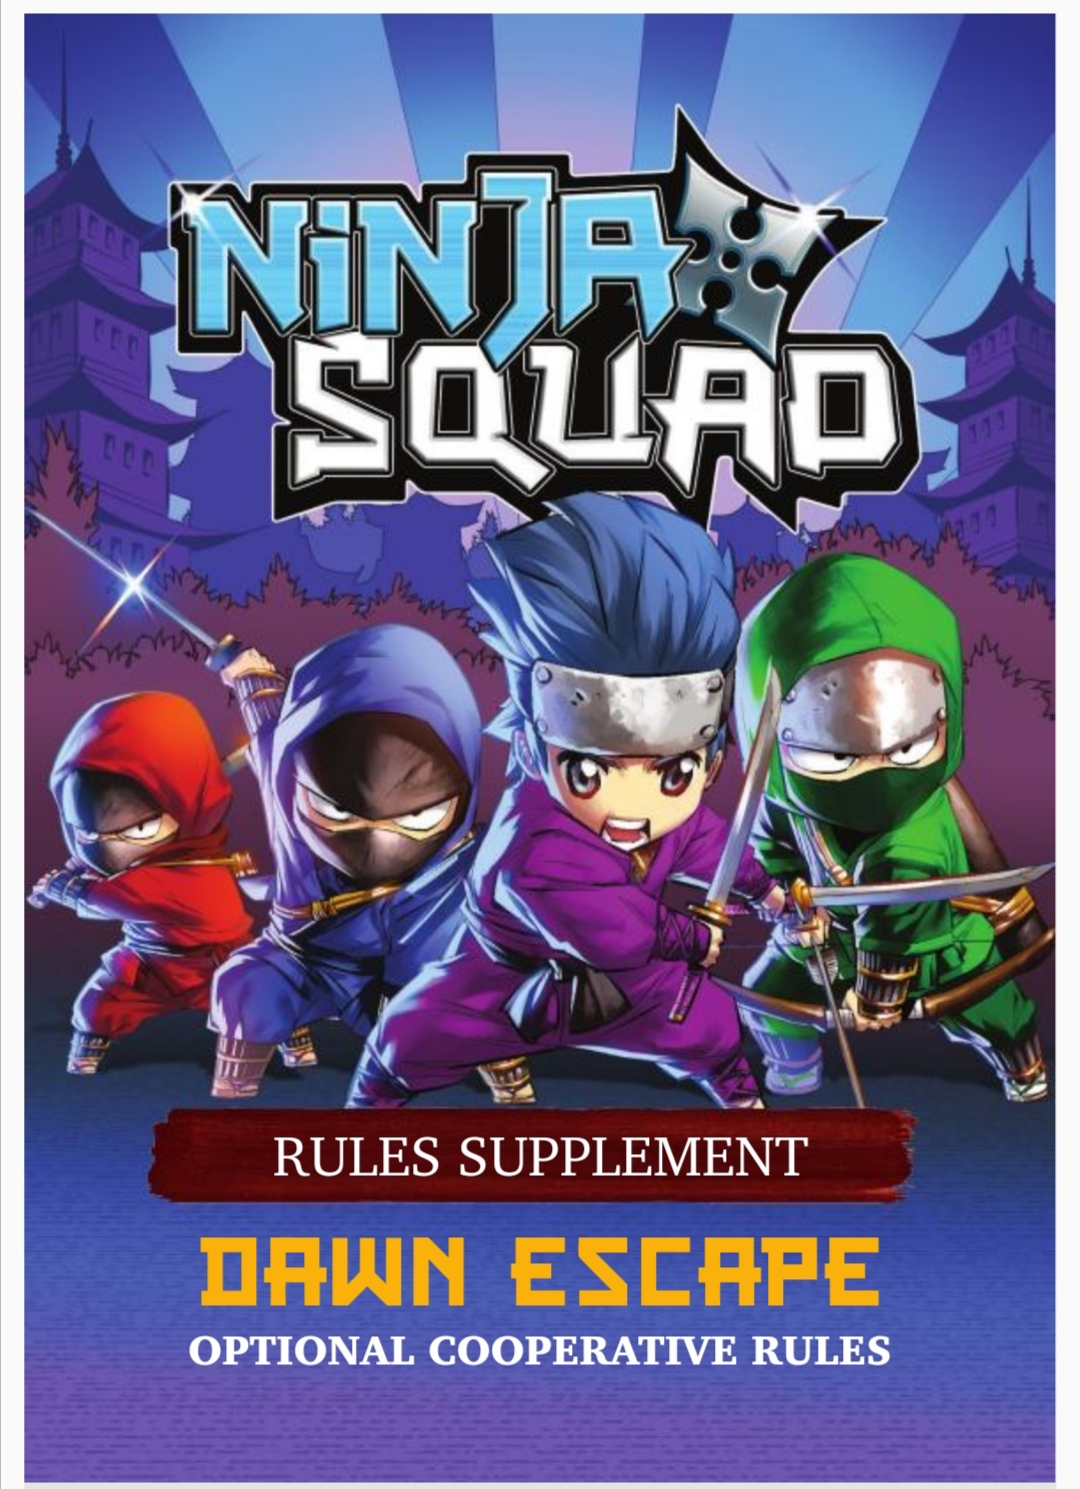 Ninja Squad cooperative rules